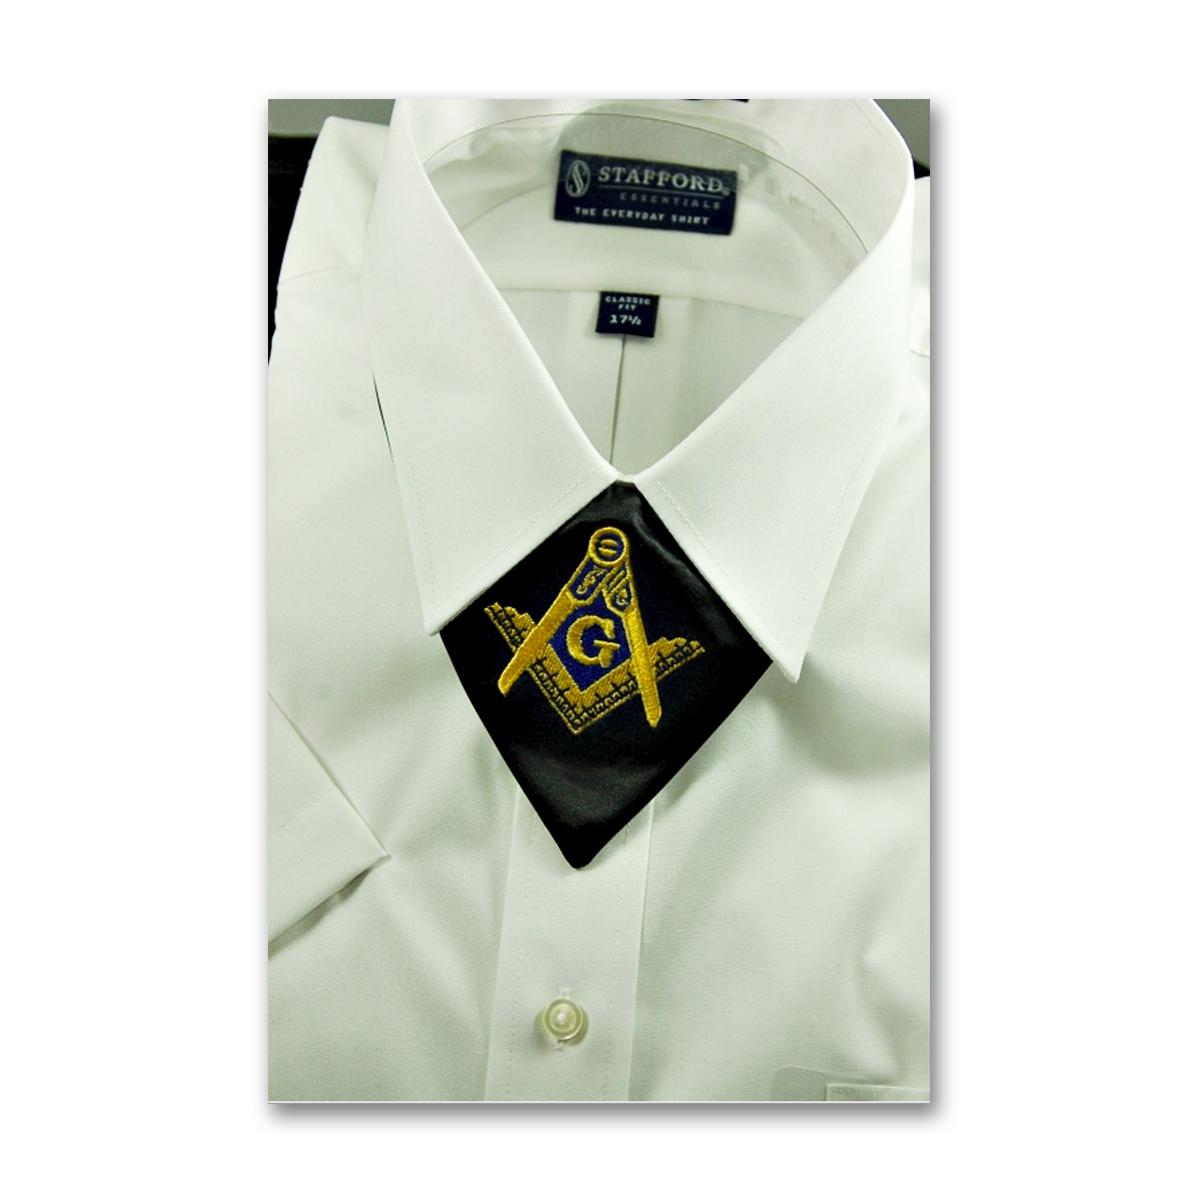 Black /& Gold Square /& Compass Masonic Cravat